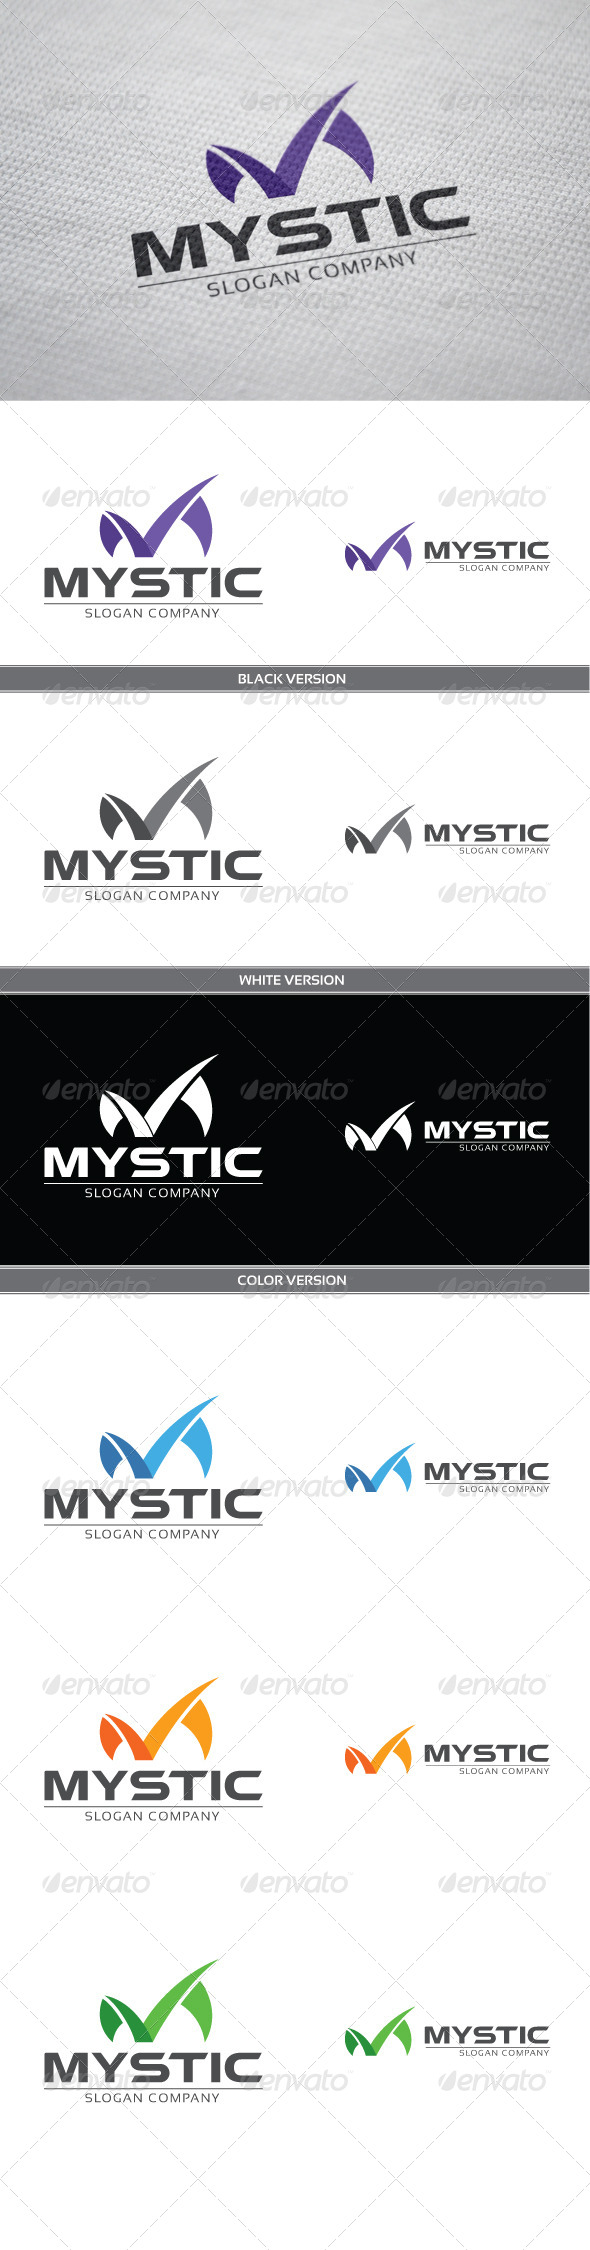 Mystic - Letters Logo Templates